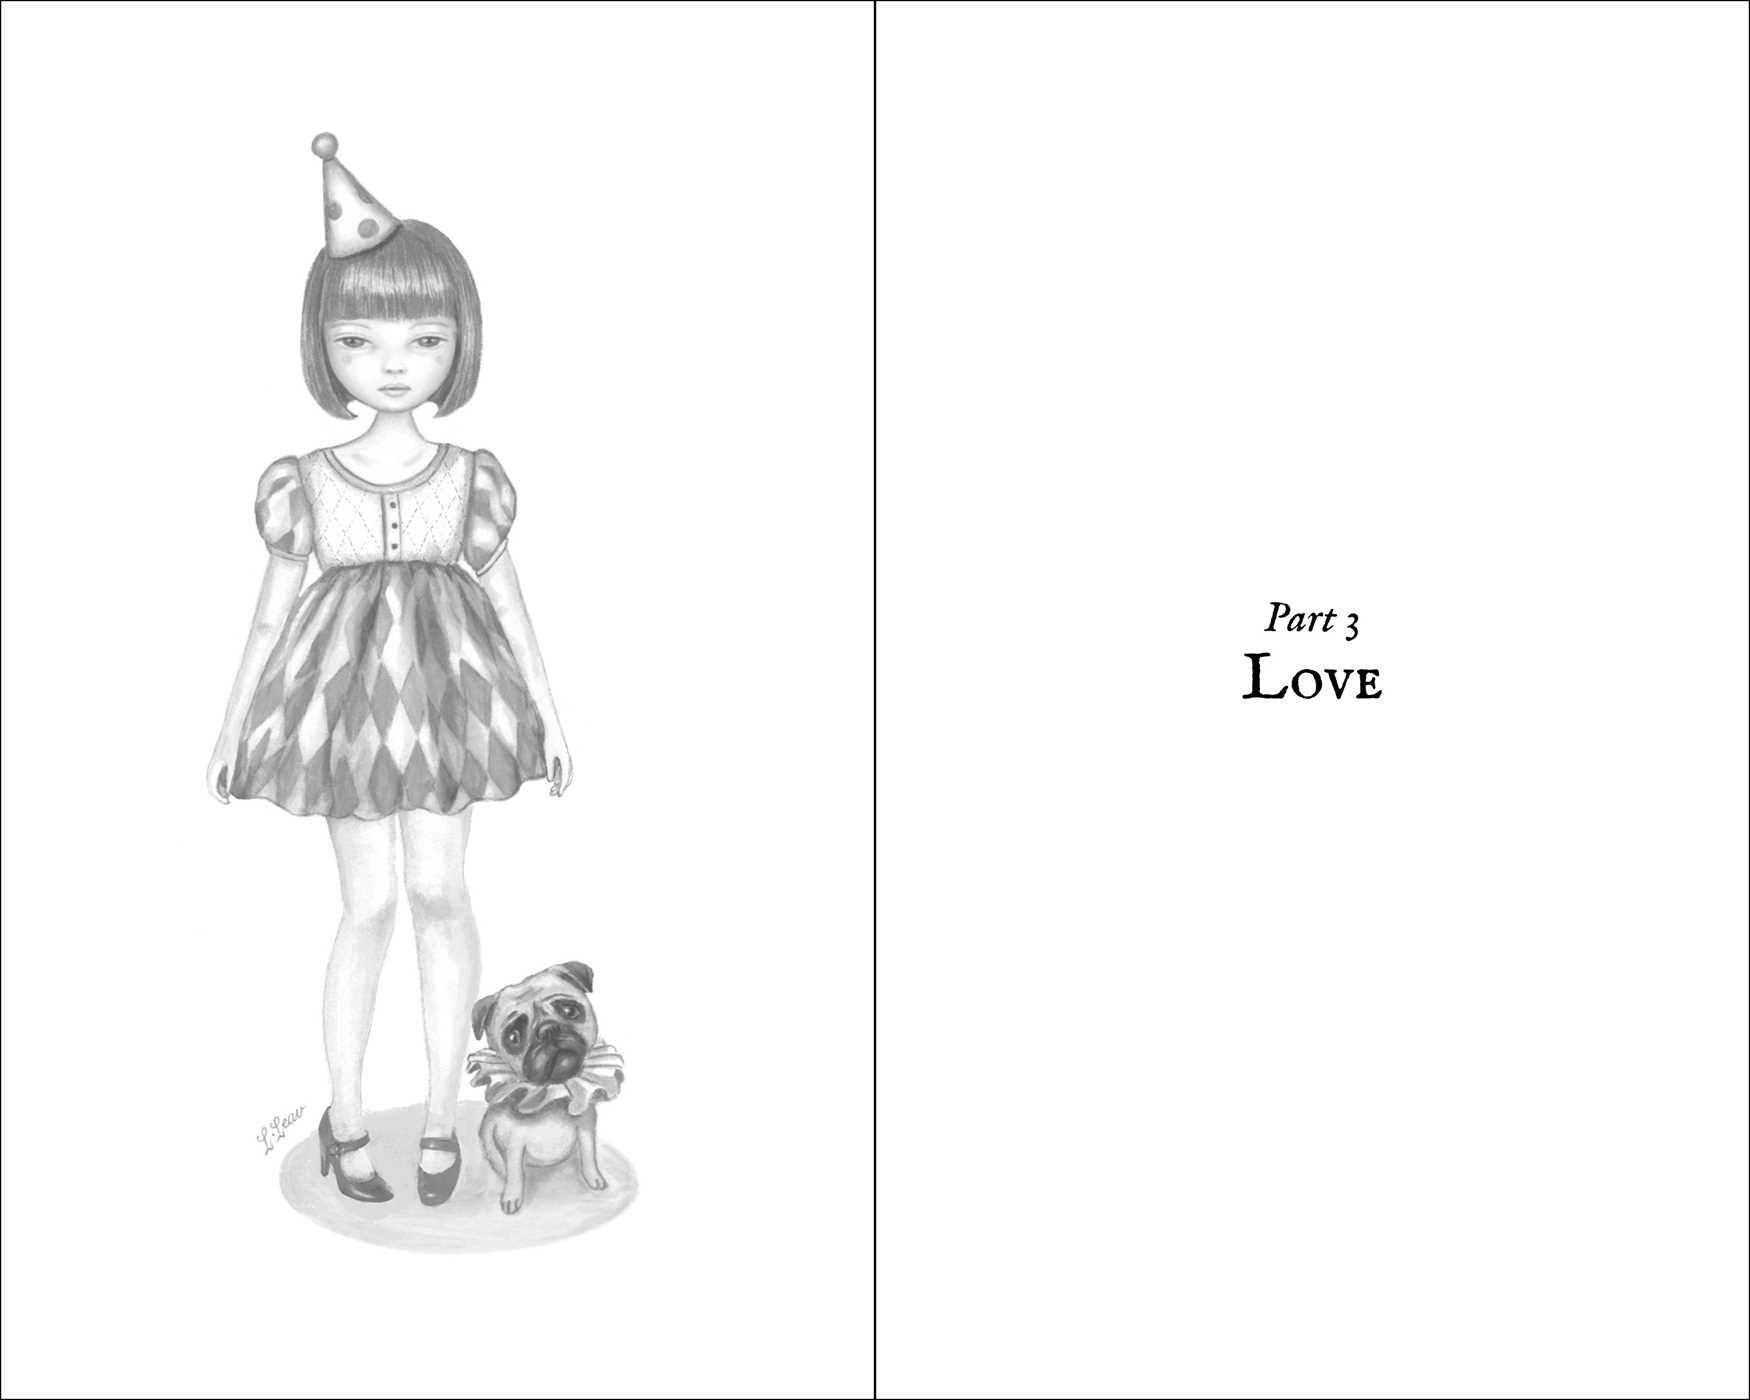 love and misadventure epub download free